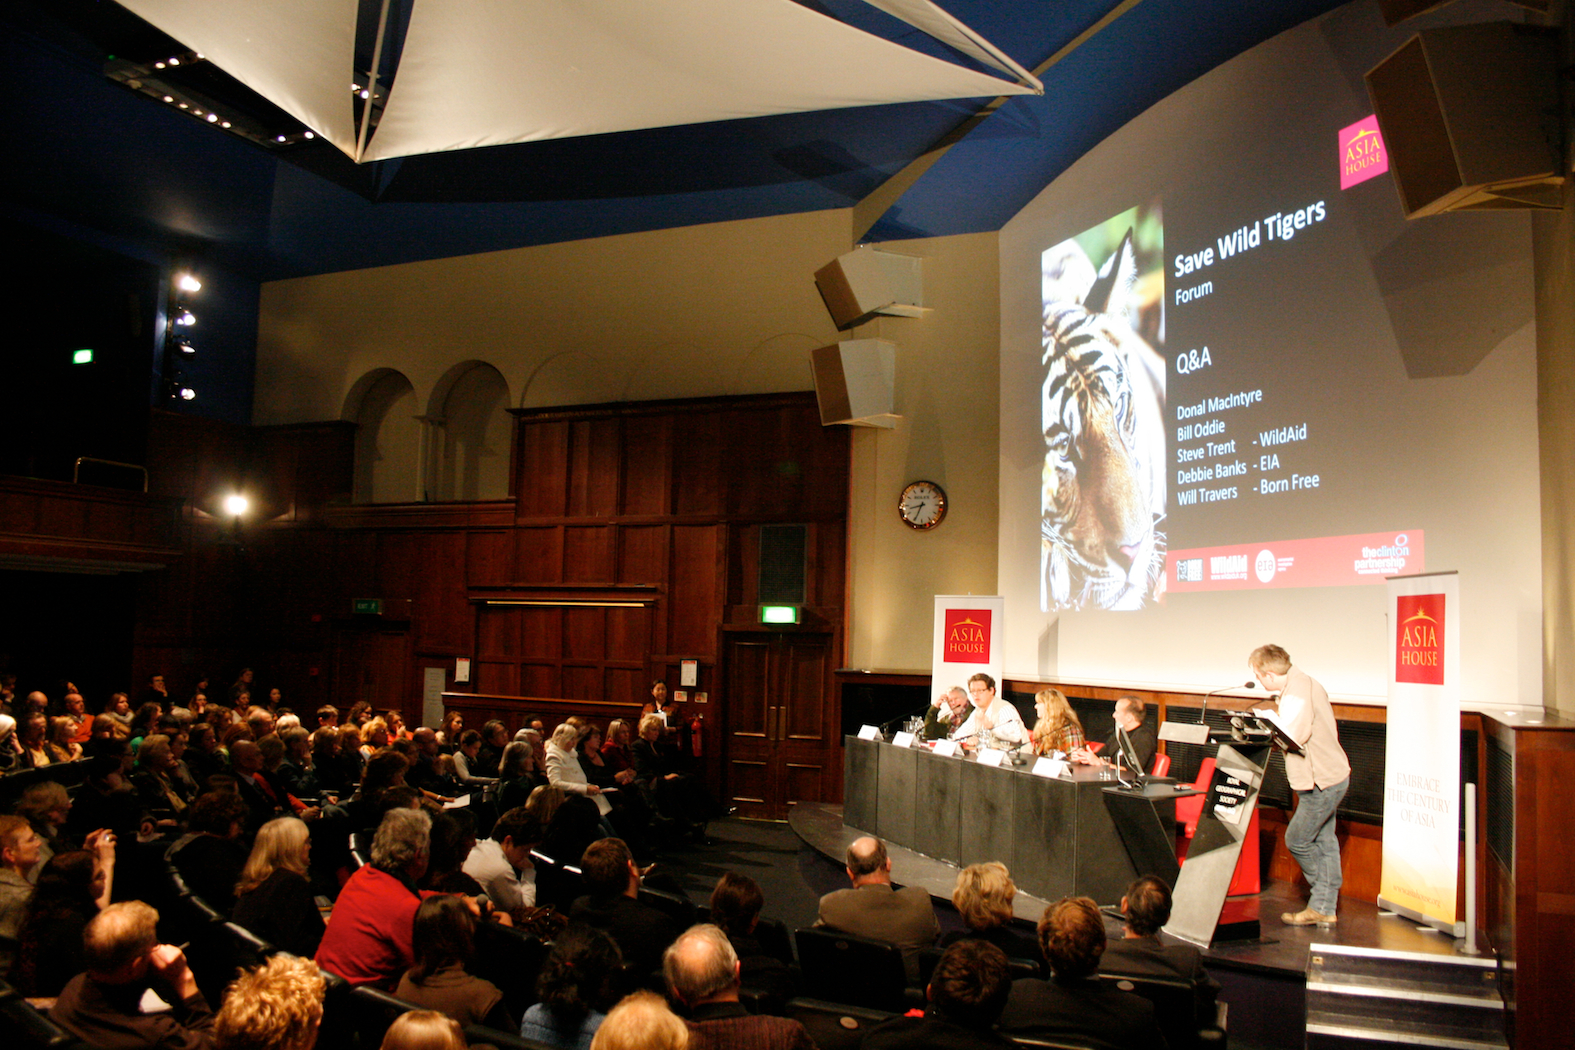 Save the Wild Tiger Forum - Dec 2010. Credit EIA